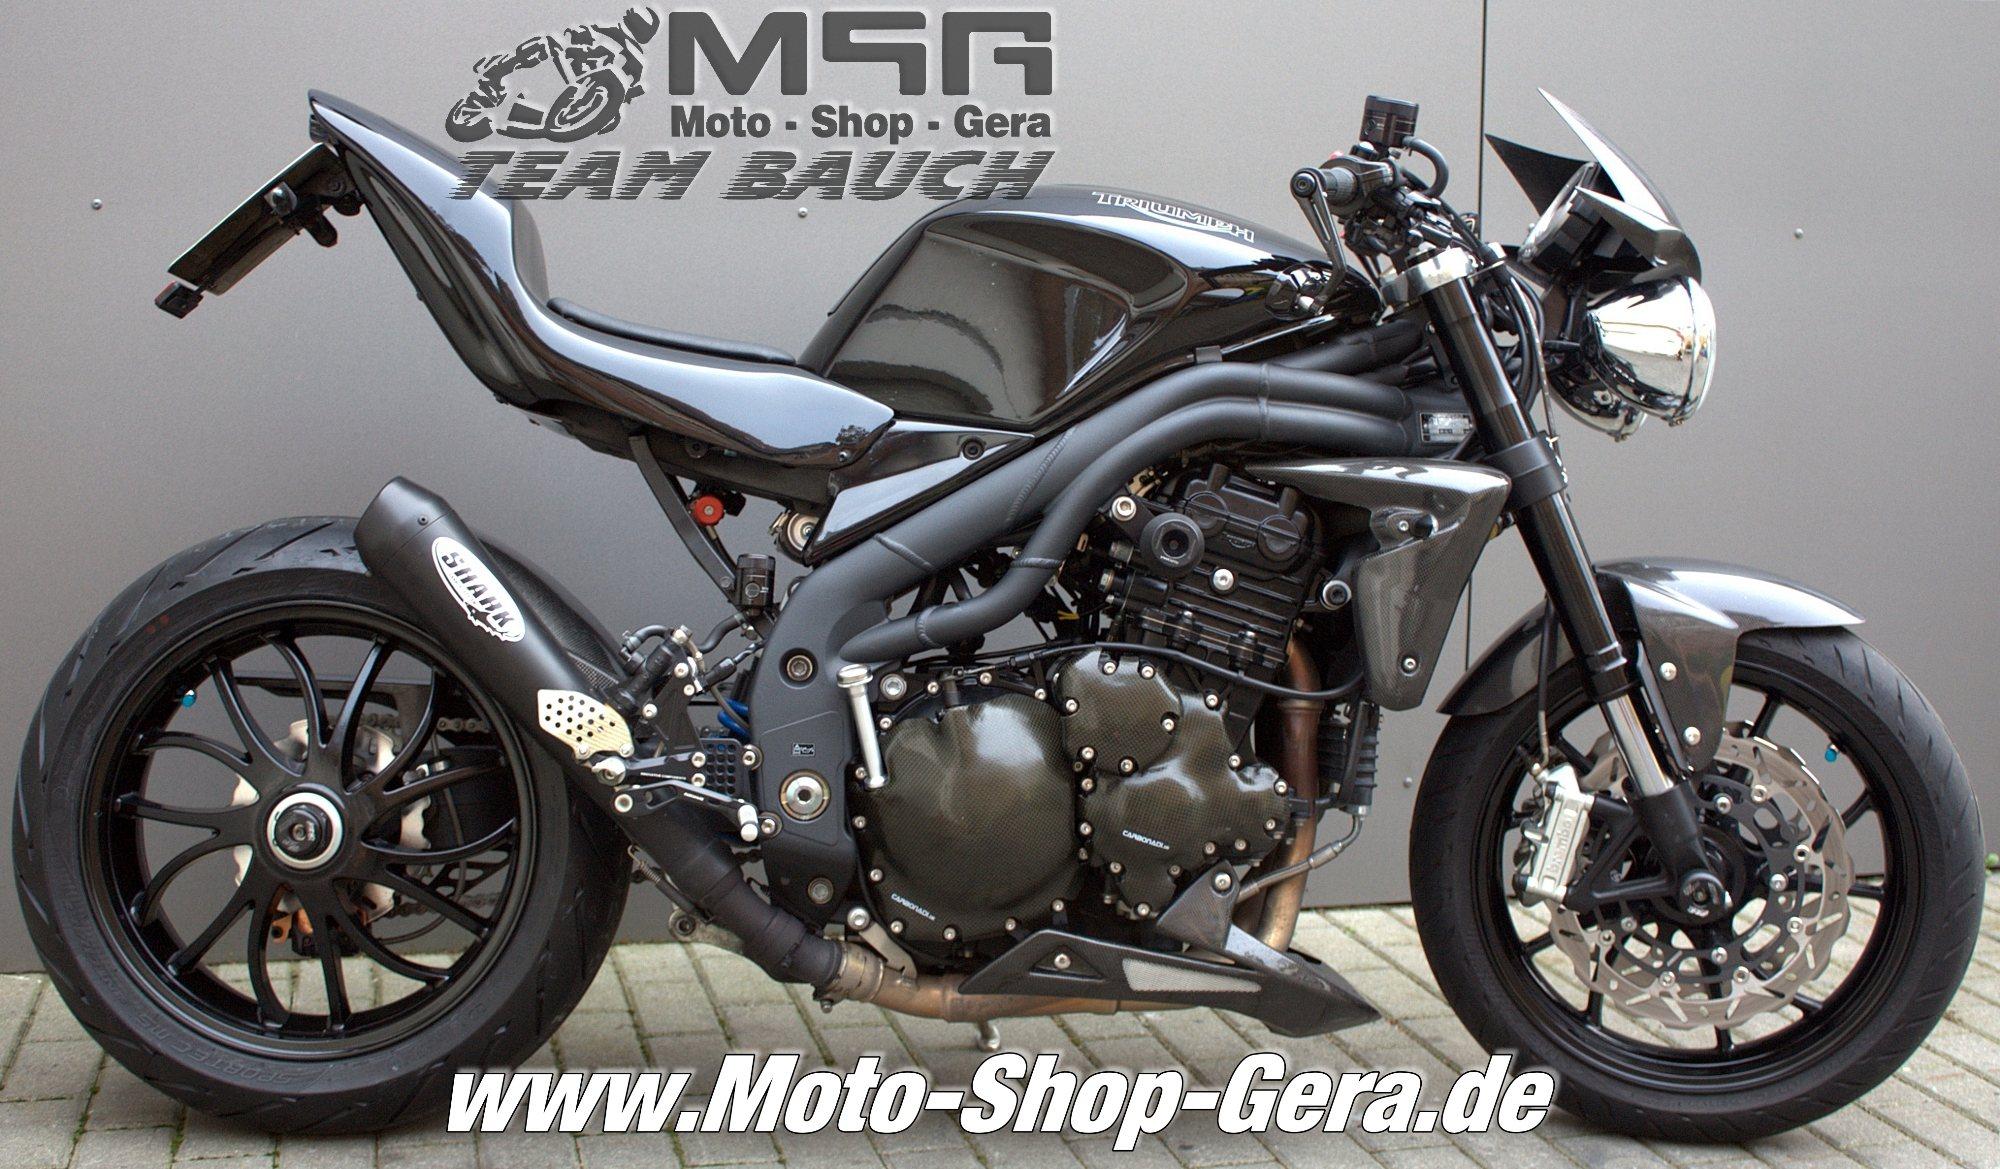 Umgebautes Motorrad Triumph Speed Triple 1050 von Triumph